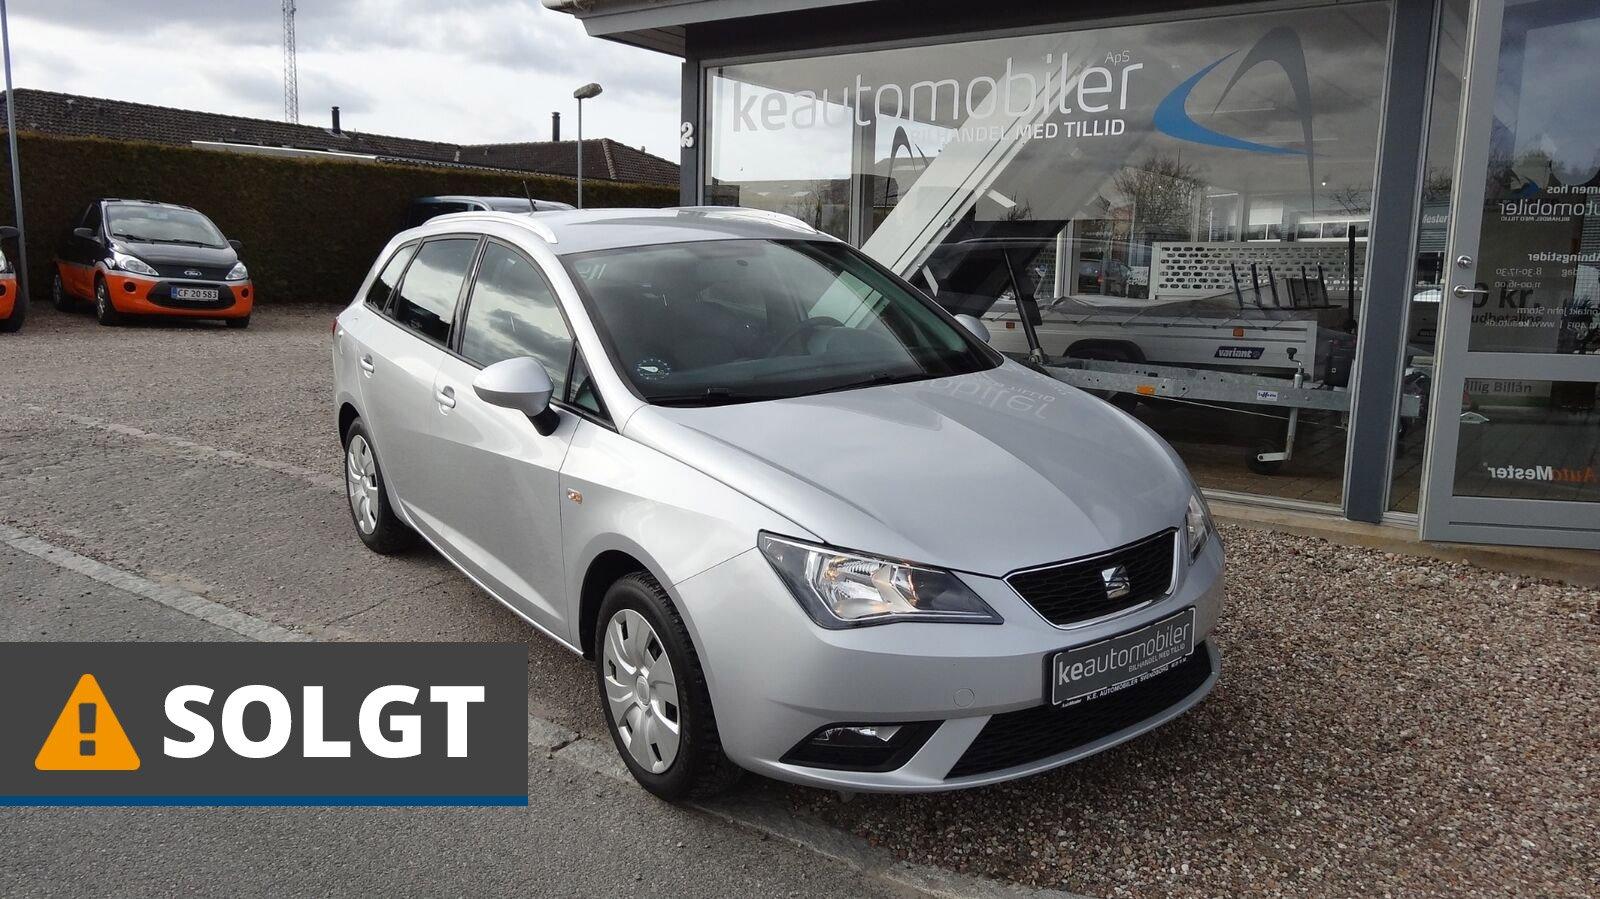 Seat Ibiza TSi 105 Style ST Eco 1,2 Benzin 105 Hk (2014) // SOLGT